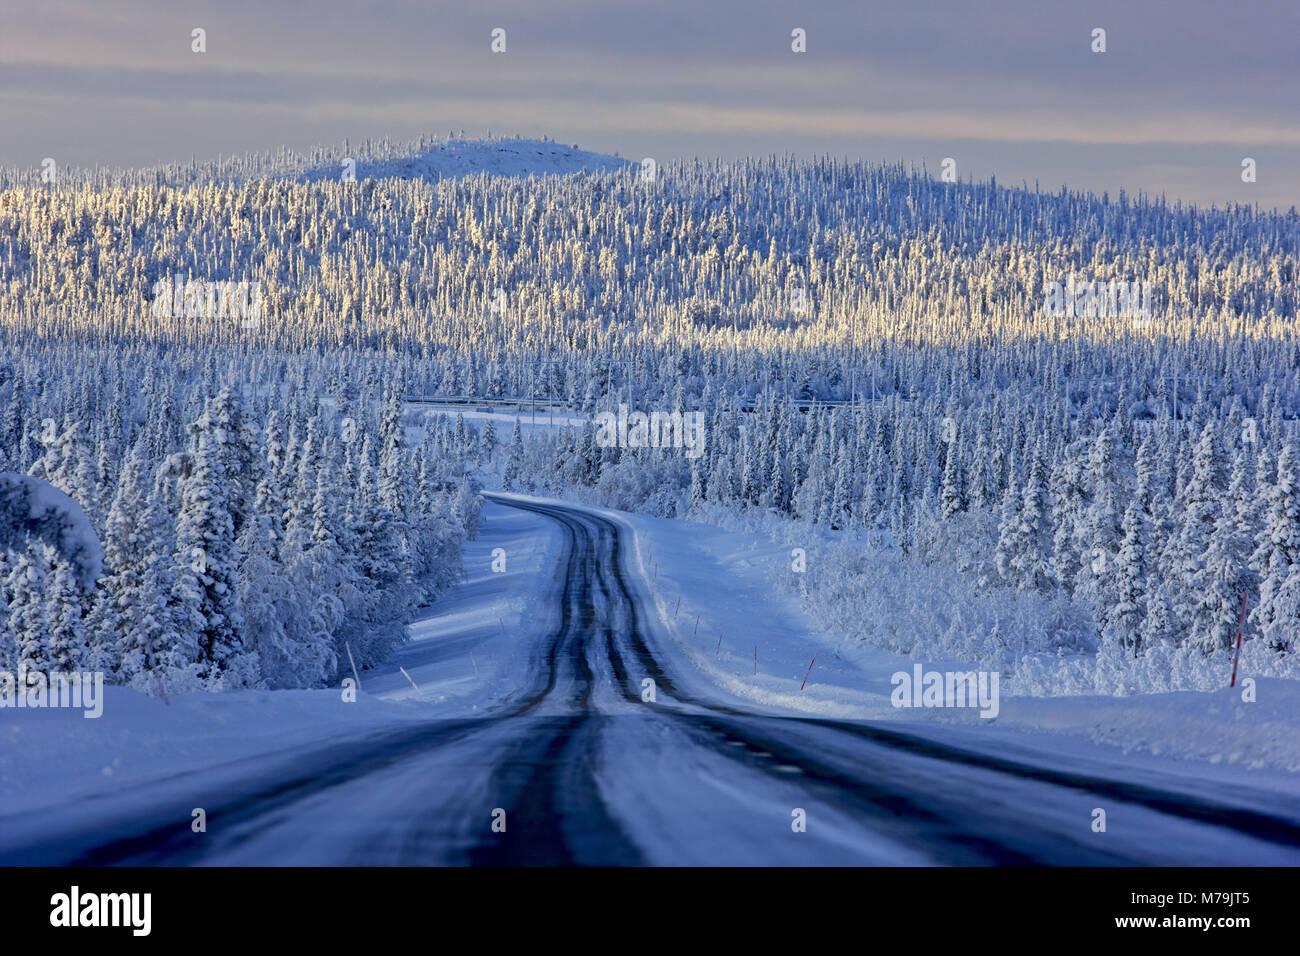 Sweden, Swedish Lapland, Gällivare, winter, winter scenery, - Stock Image